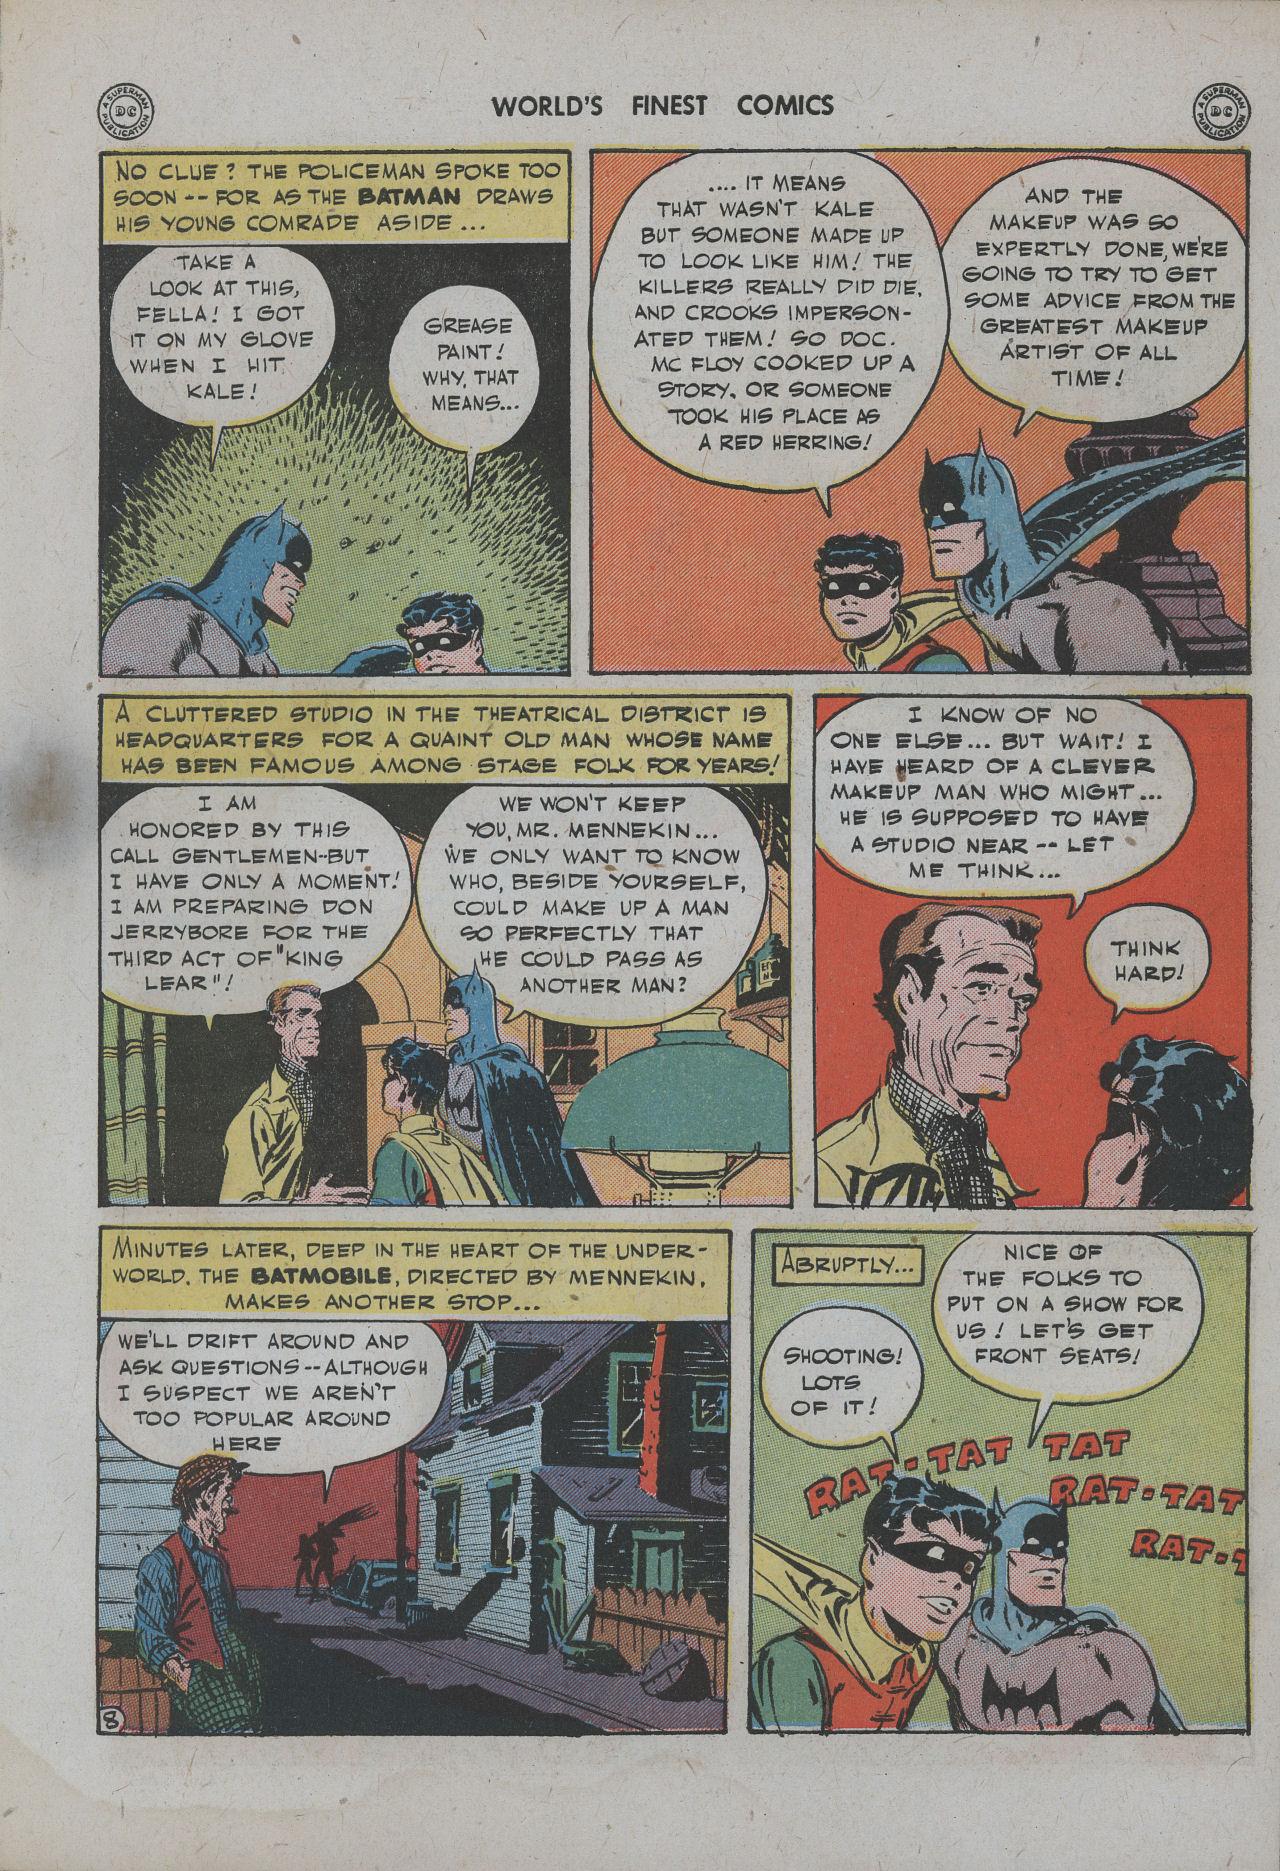 Read online World's Finest Comics comic -  Issue #15 - 78